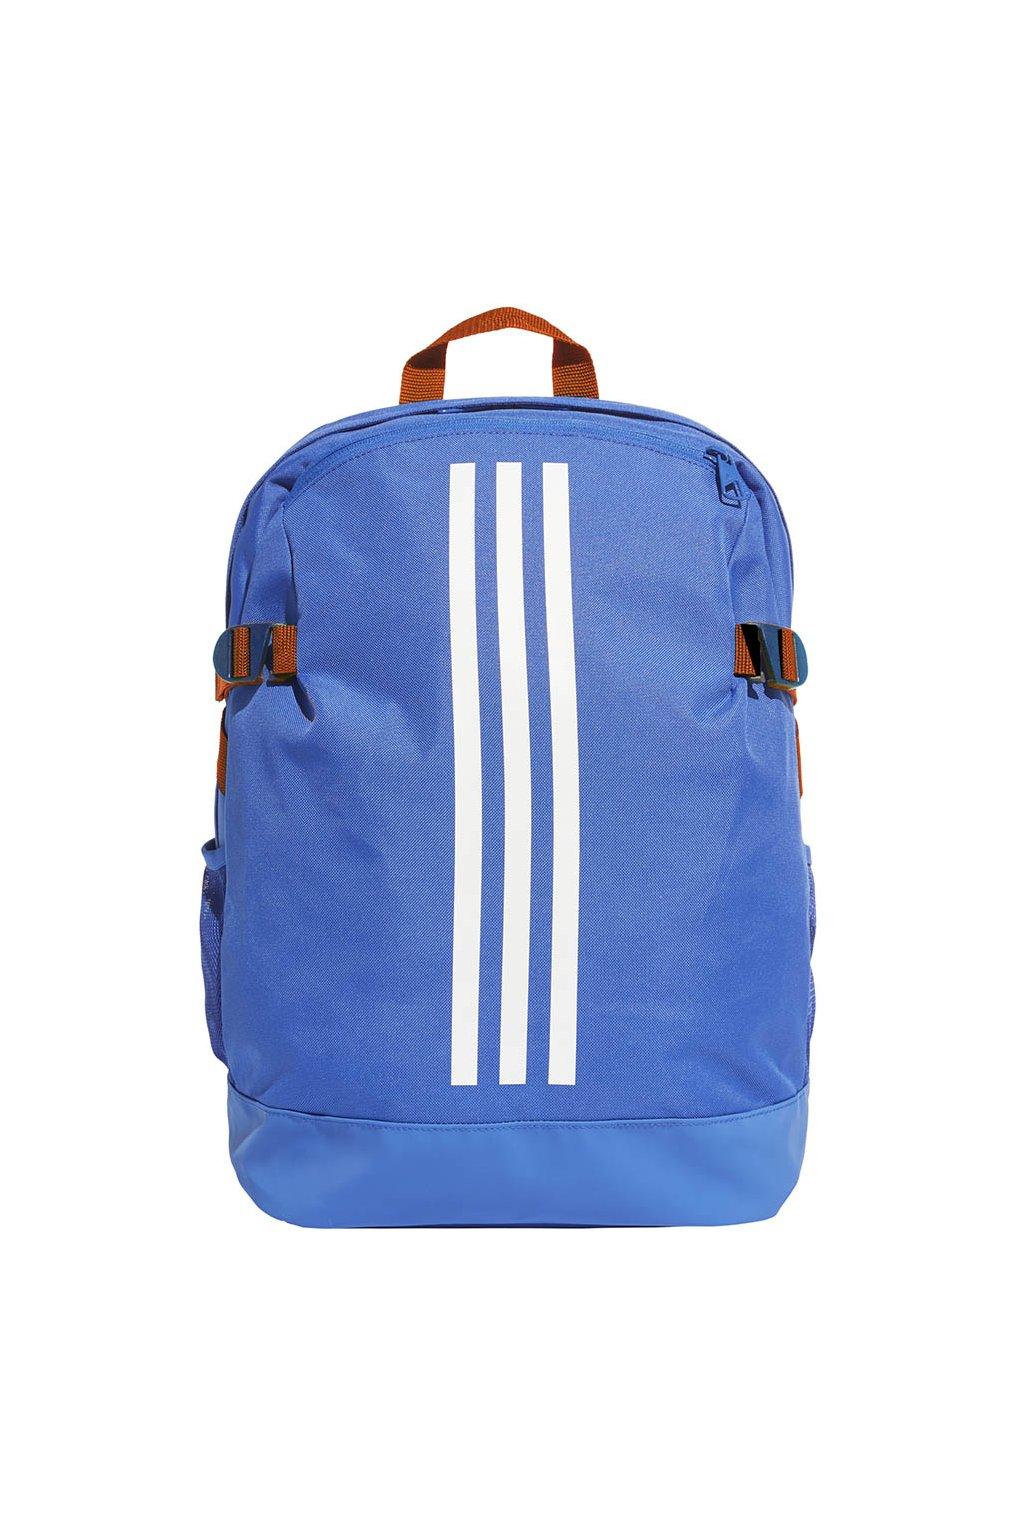 Batoh adidas BP Power IV M modrý DY1970